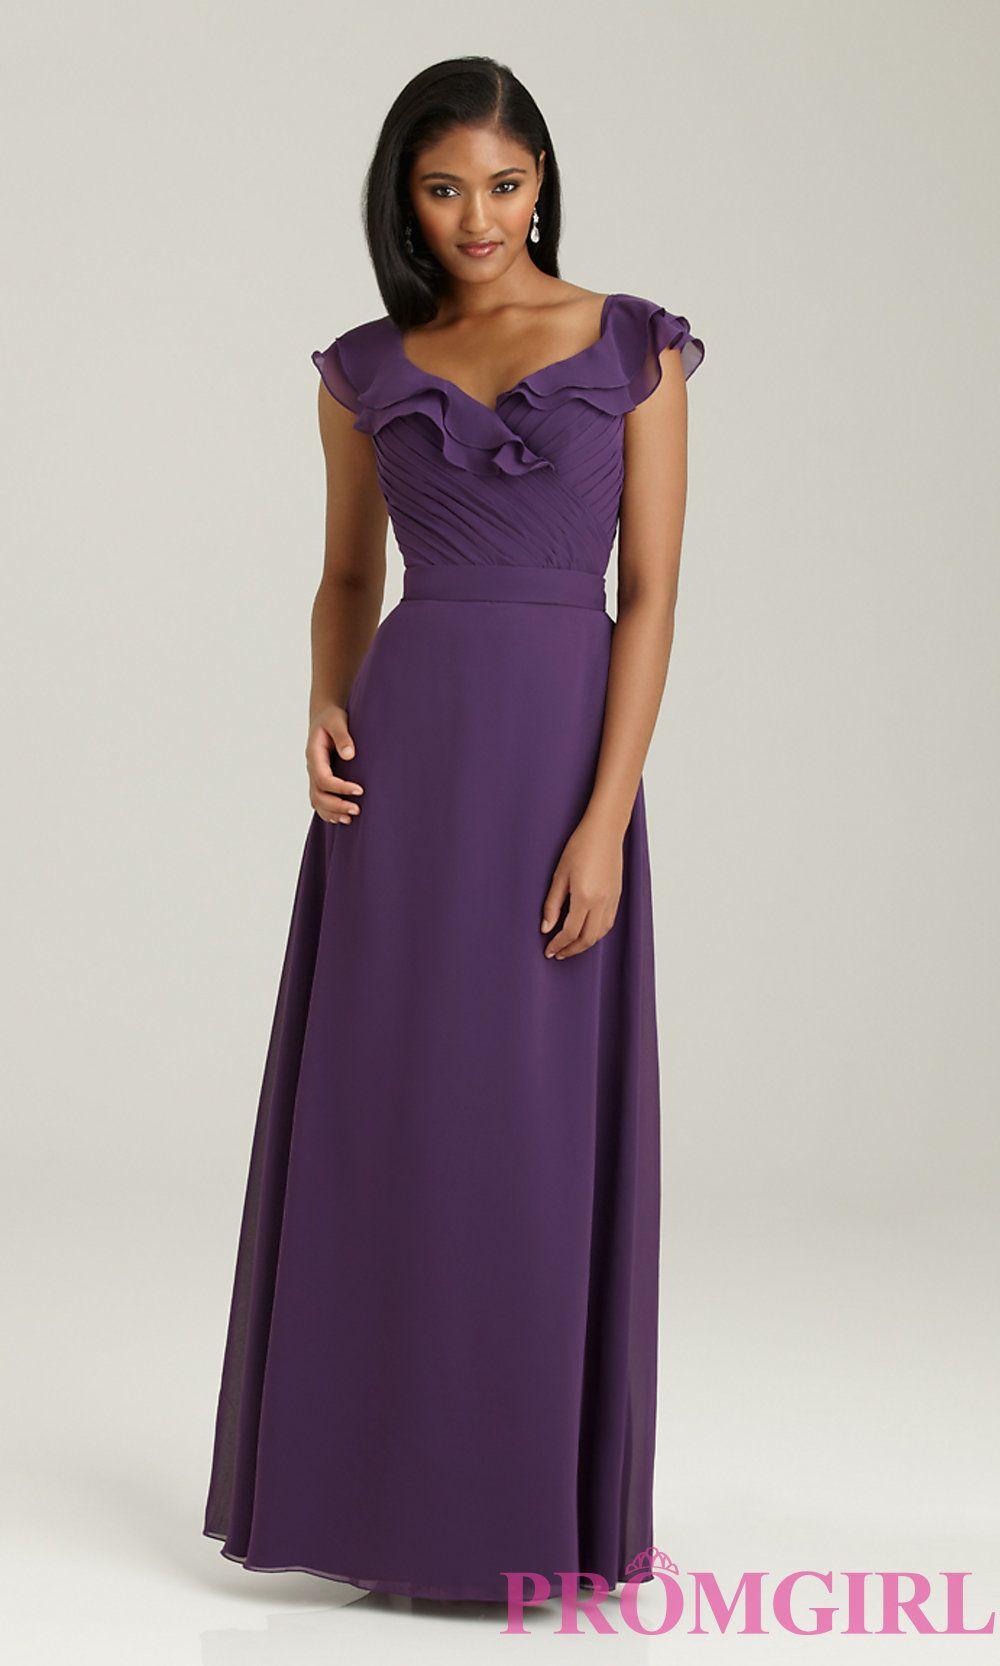 Long V-Neck Bridesmaids Dress with Cap SleevesNM-1304